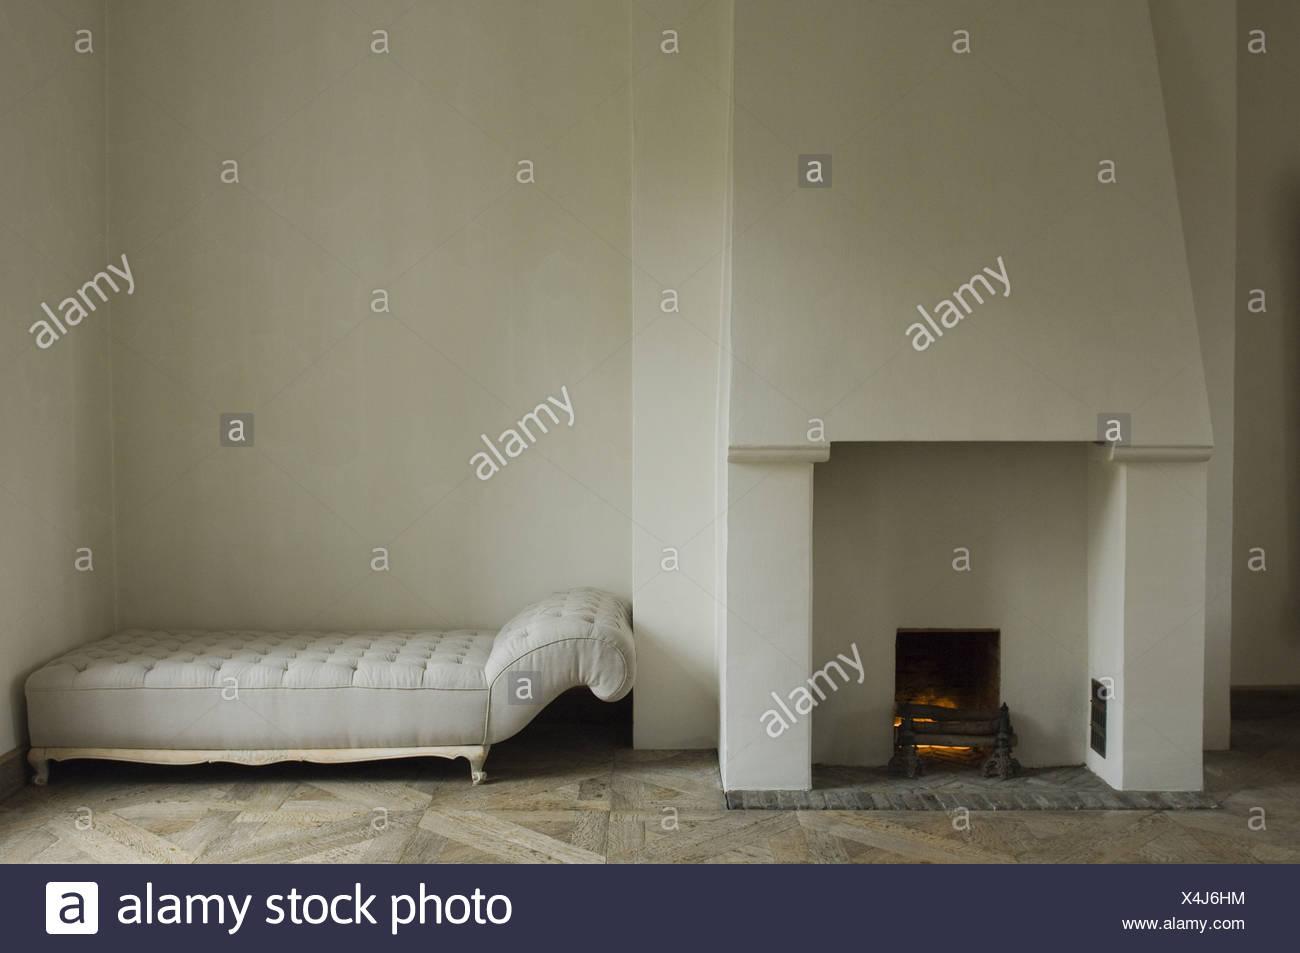 chimney and sofa - Stock Image